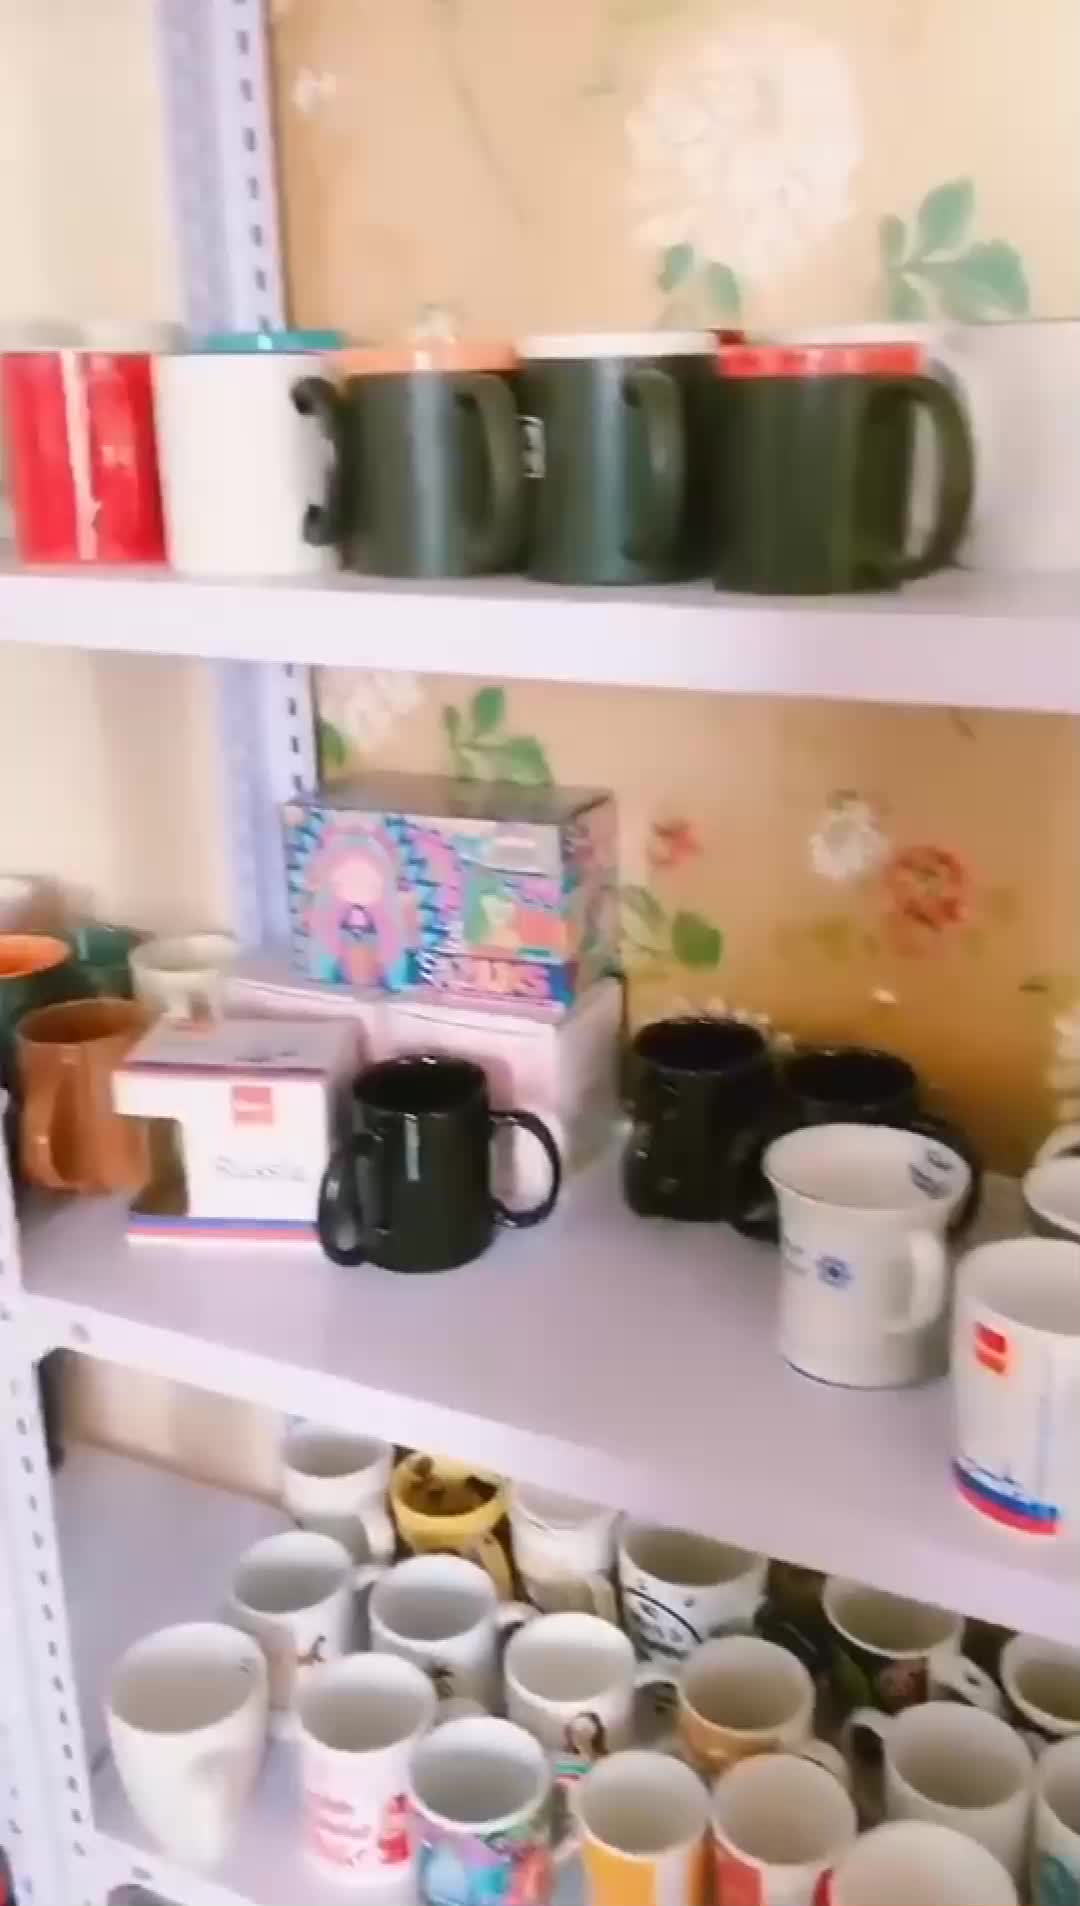 Grosir Populer Sublimasi Mug Perjalanan Disesuaikan Keramik Cangkir Kopi Sublimasi Kosong Mug